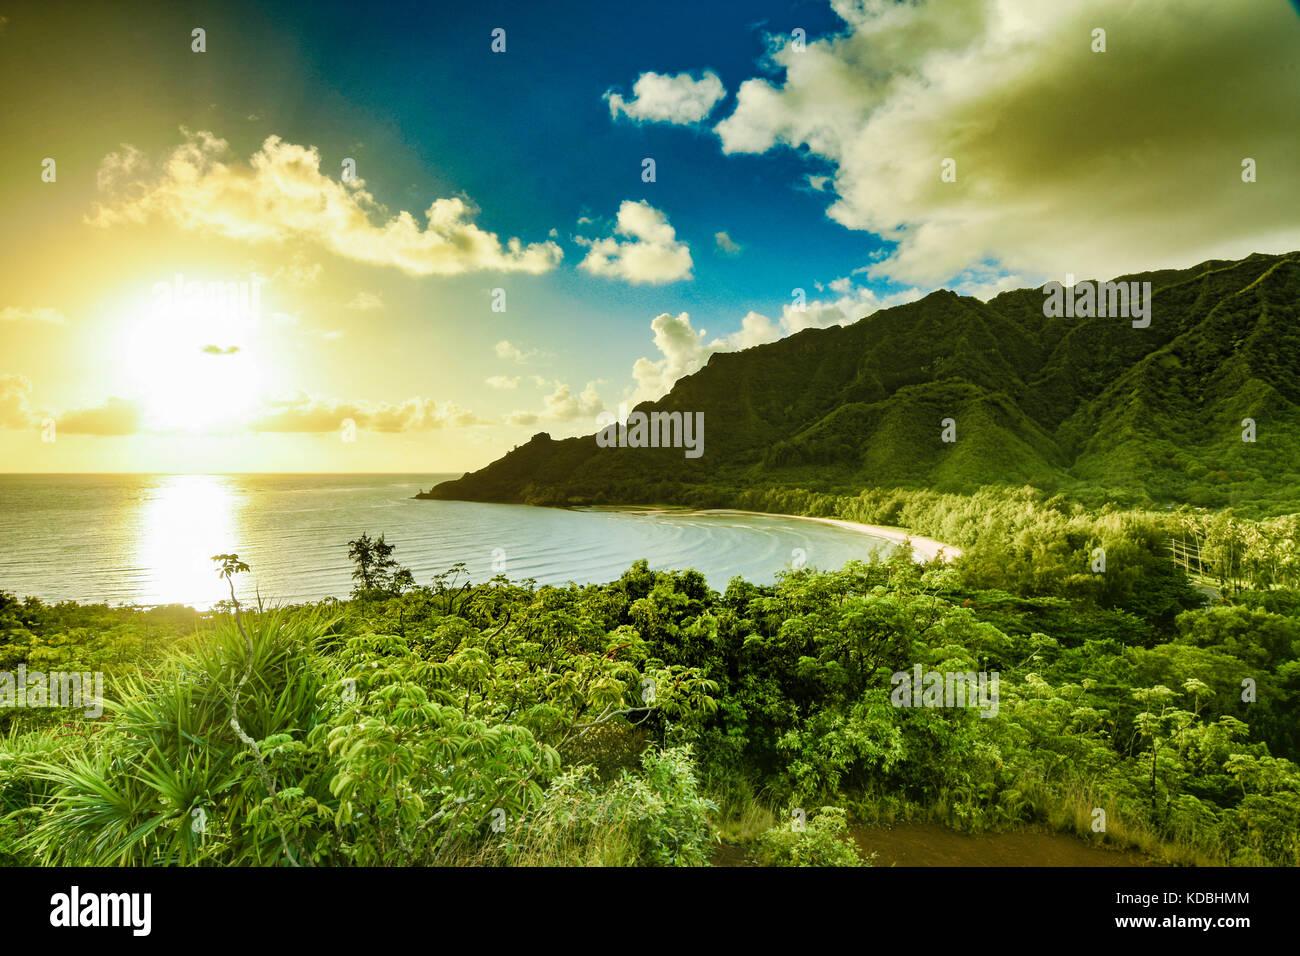 Sunrise on the east coast of Oahu, Hawaii. - Stock Image